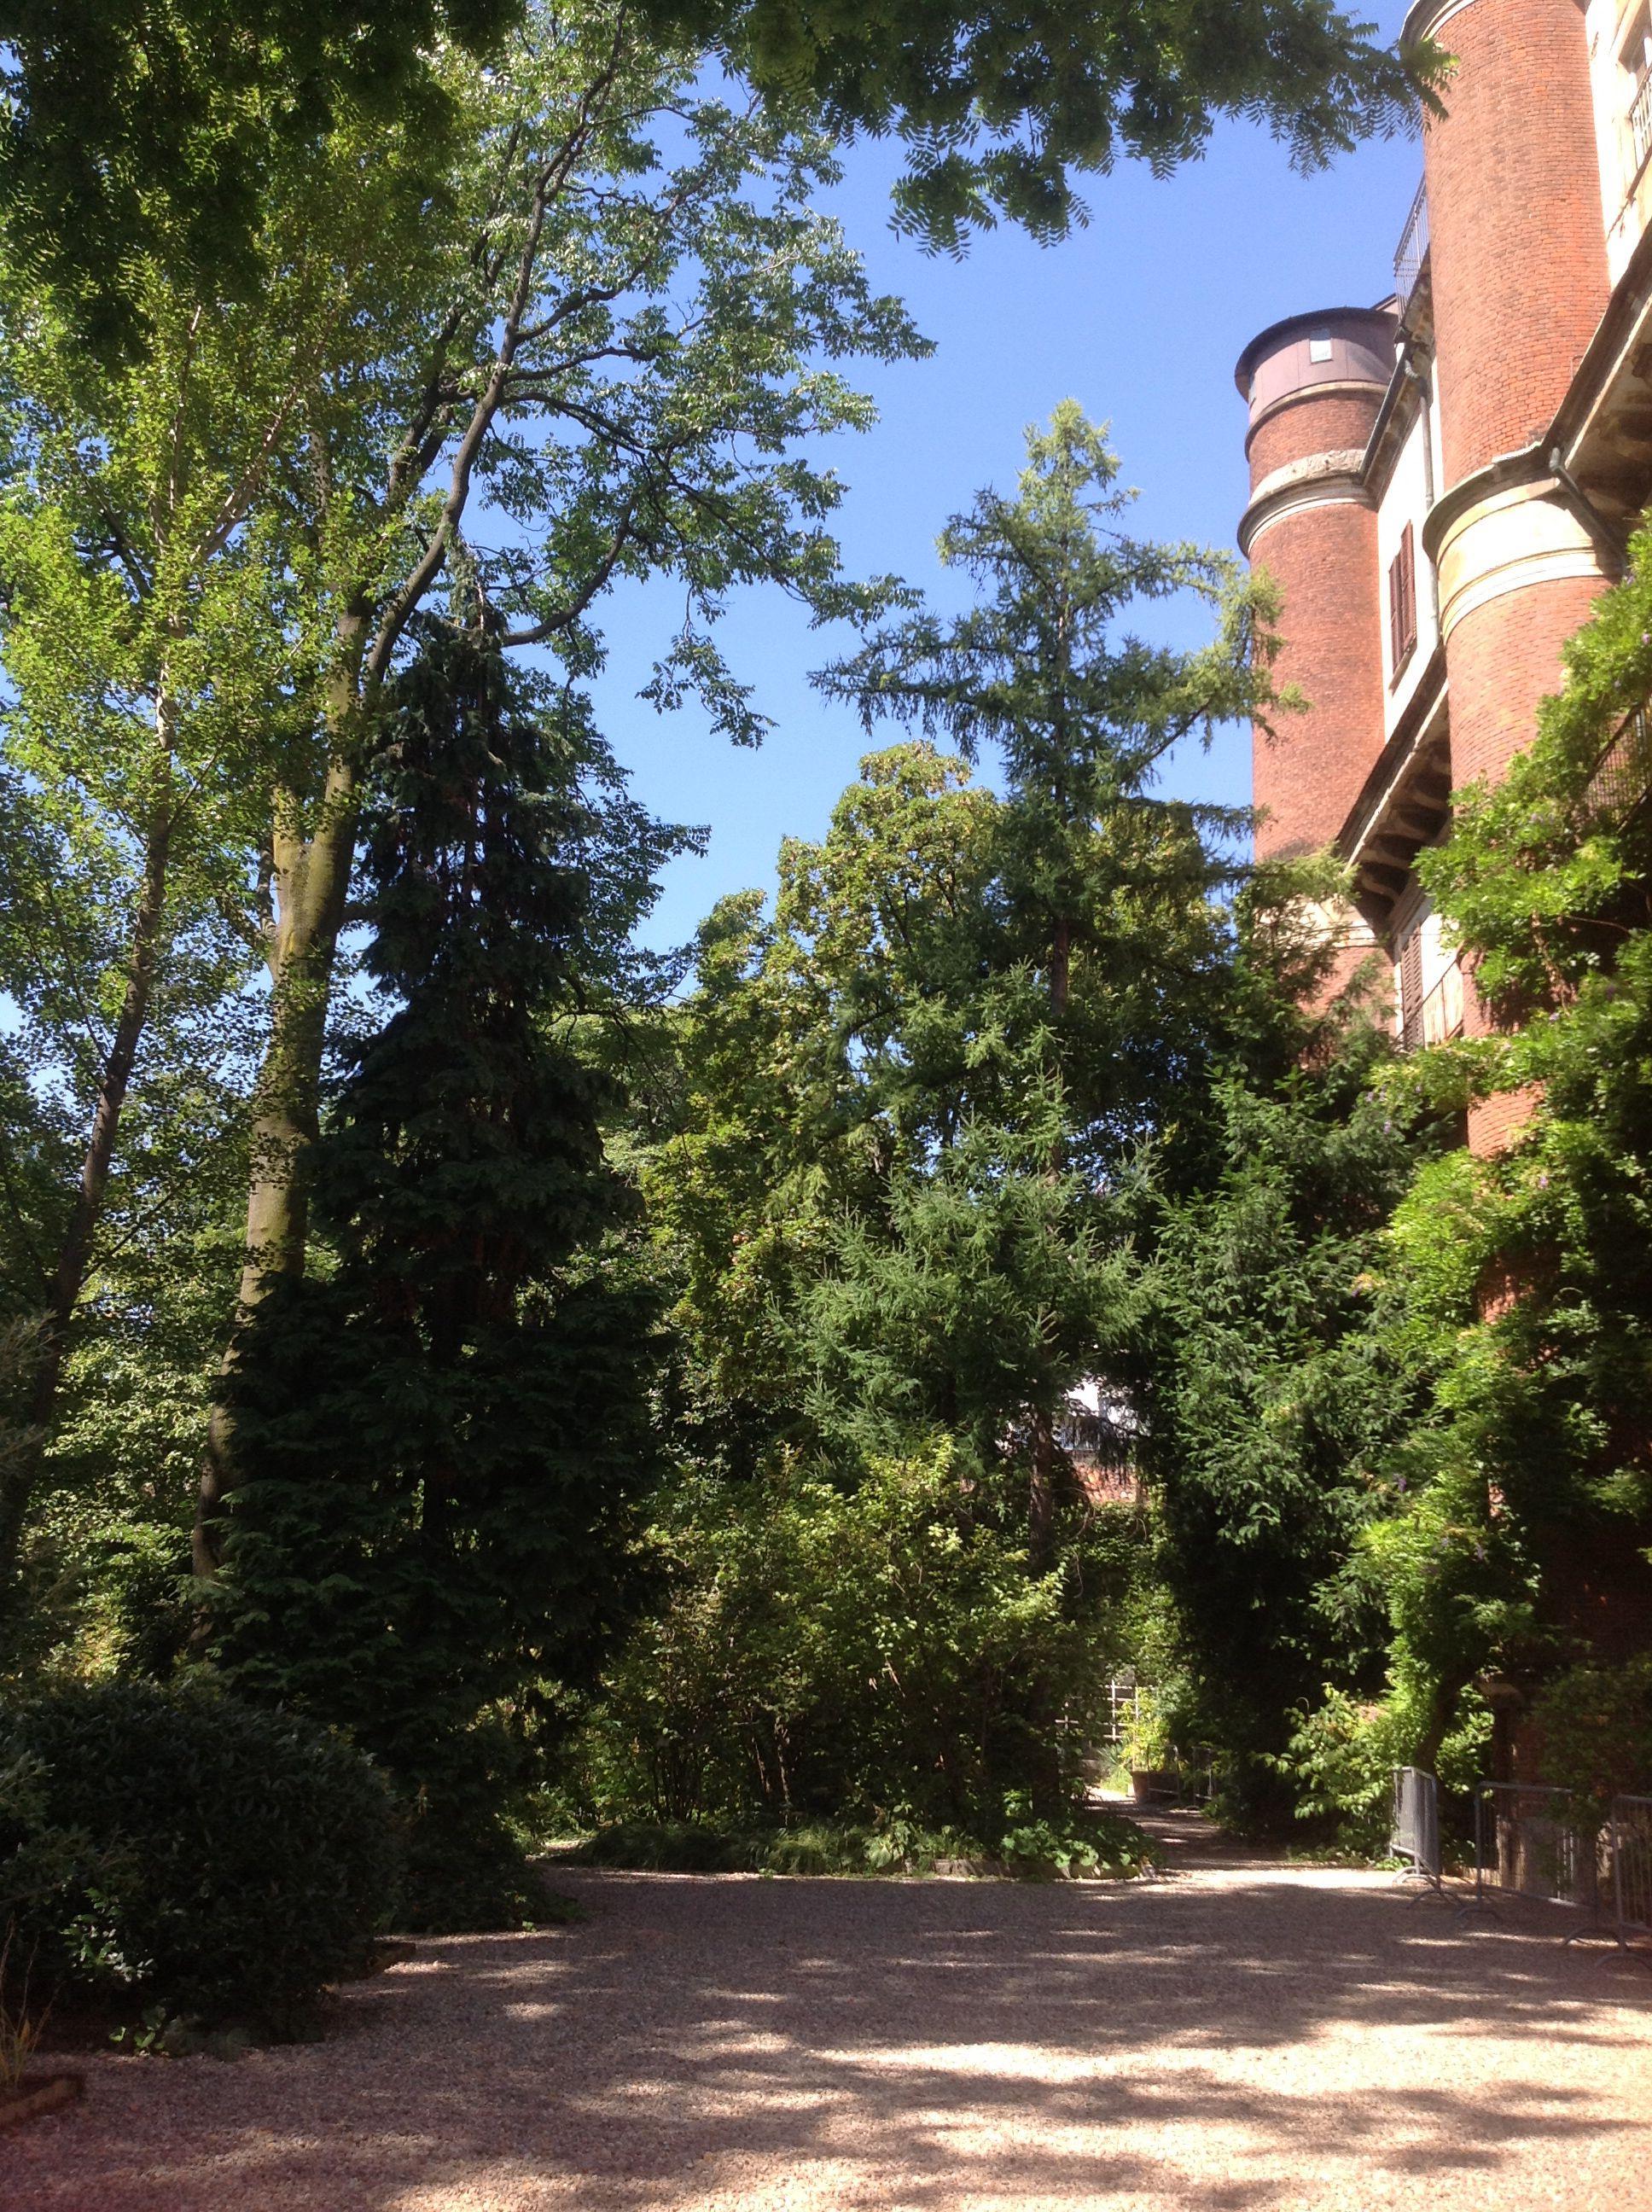 Giardino botanico di brera milano giardinissimi